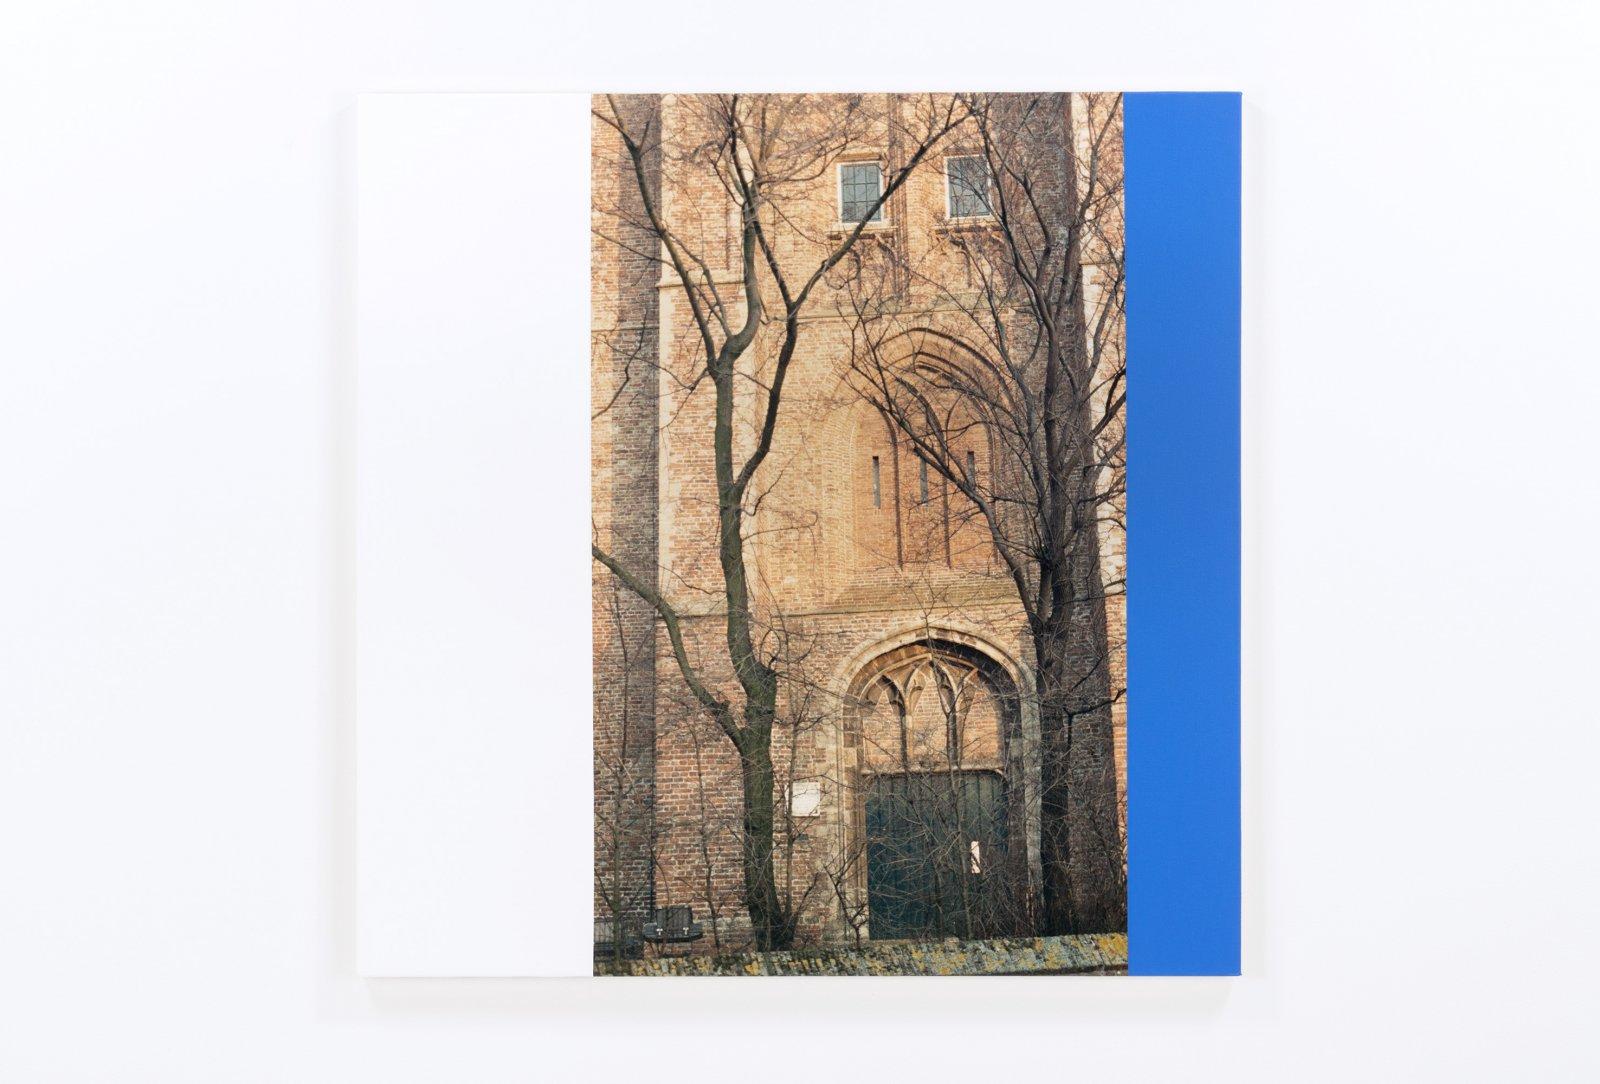 Ian Wallace,Hommage a Mondrian VII(Facade), 1990, photolaminate and acrylic on canvas, 48 x 48 in. (122 x 122 cm)